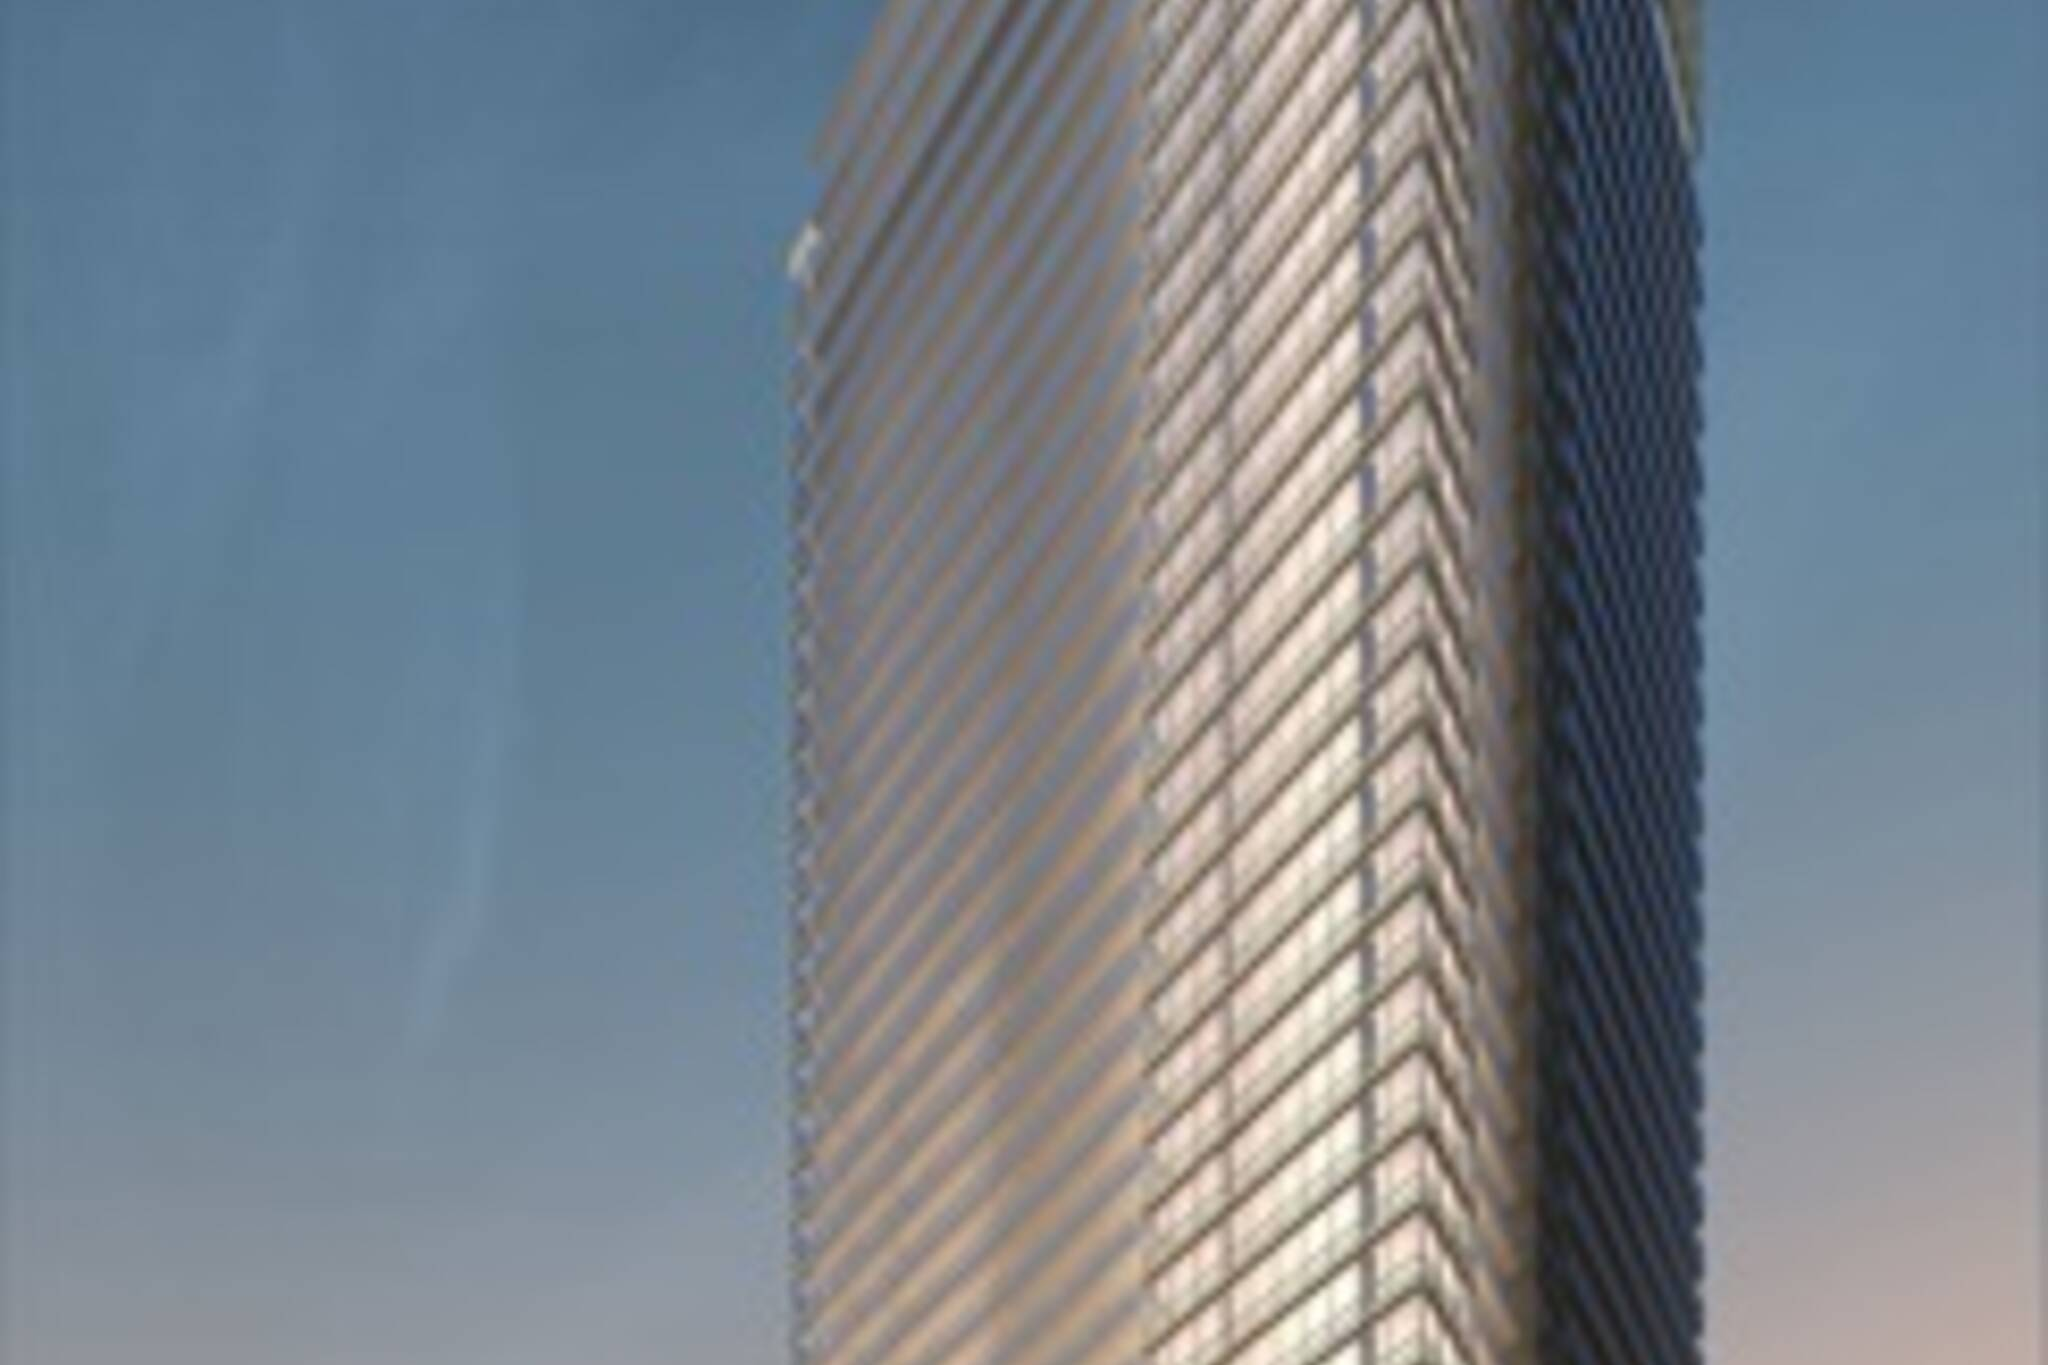 Reitman Square: TIFF's new address